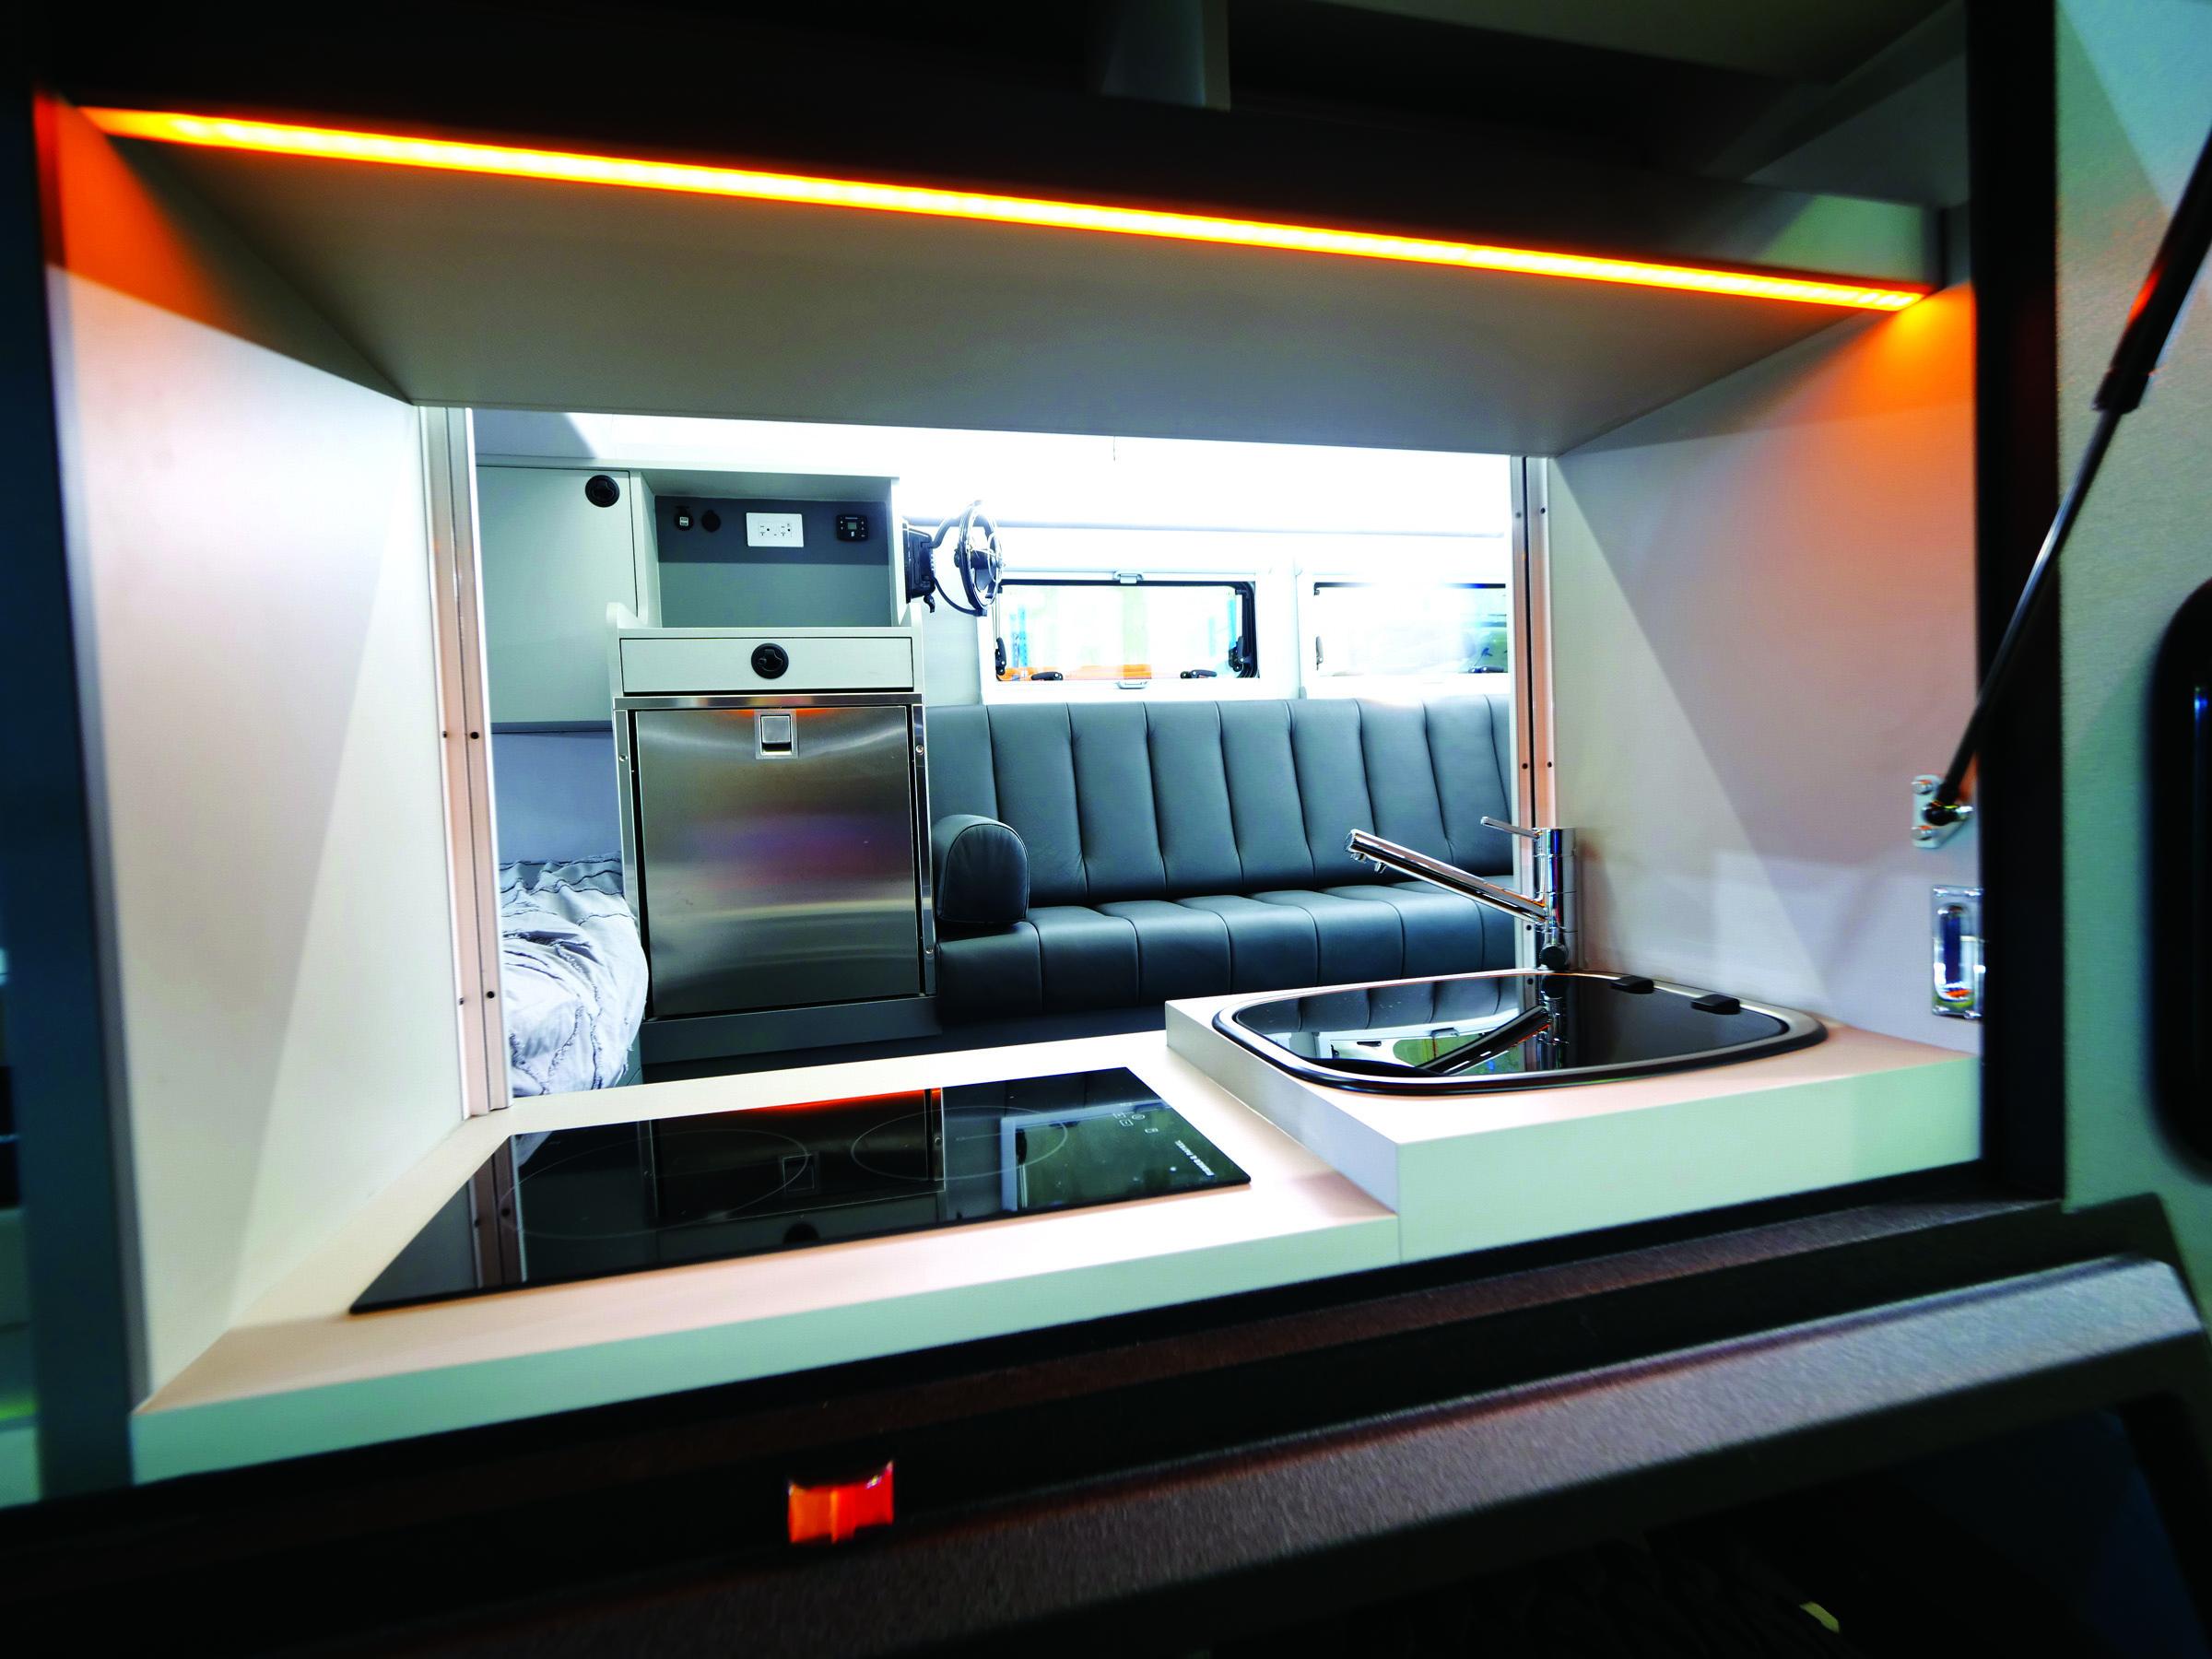 Bruder EXP-6 caravan kitchen